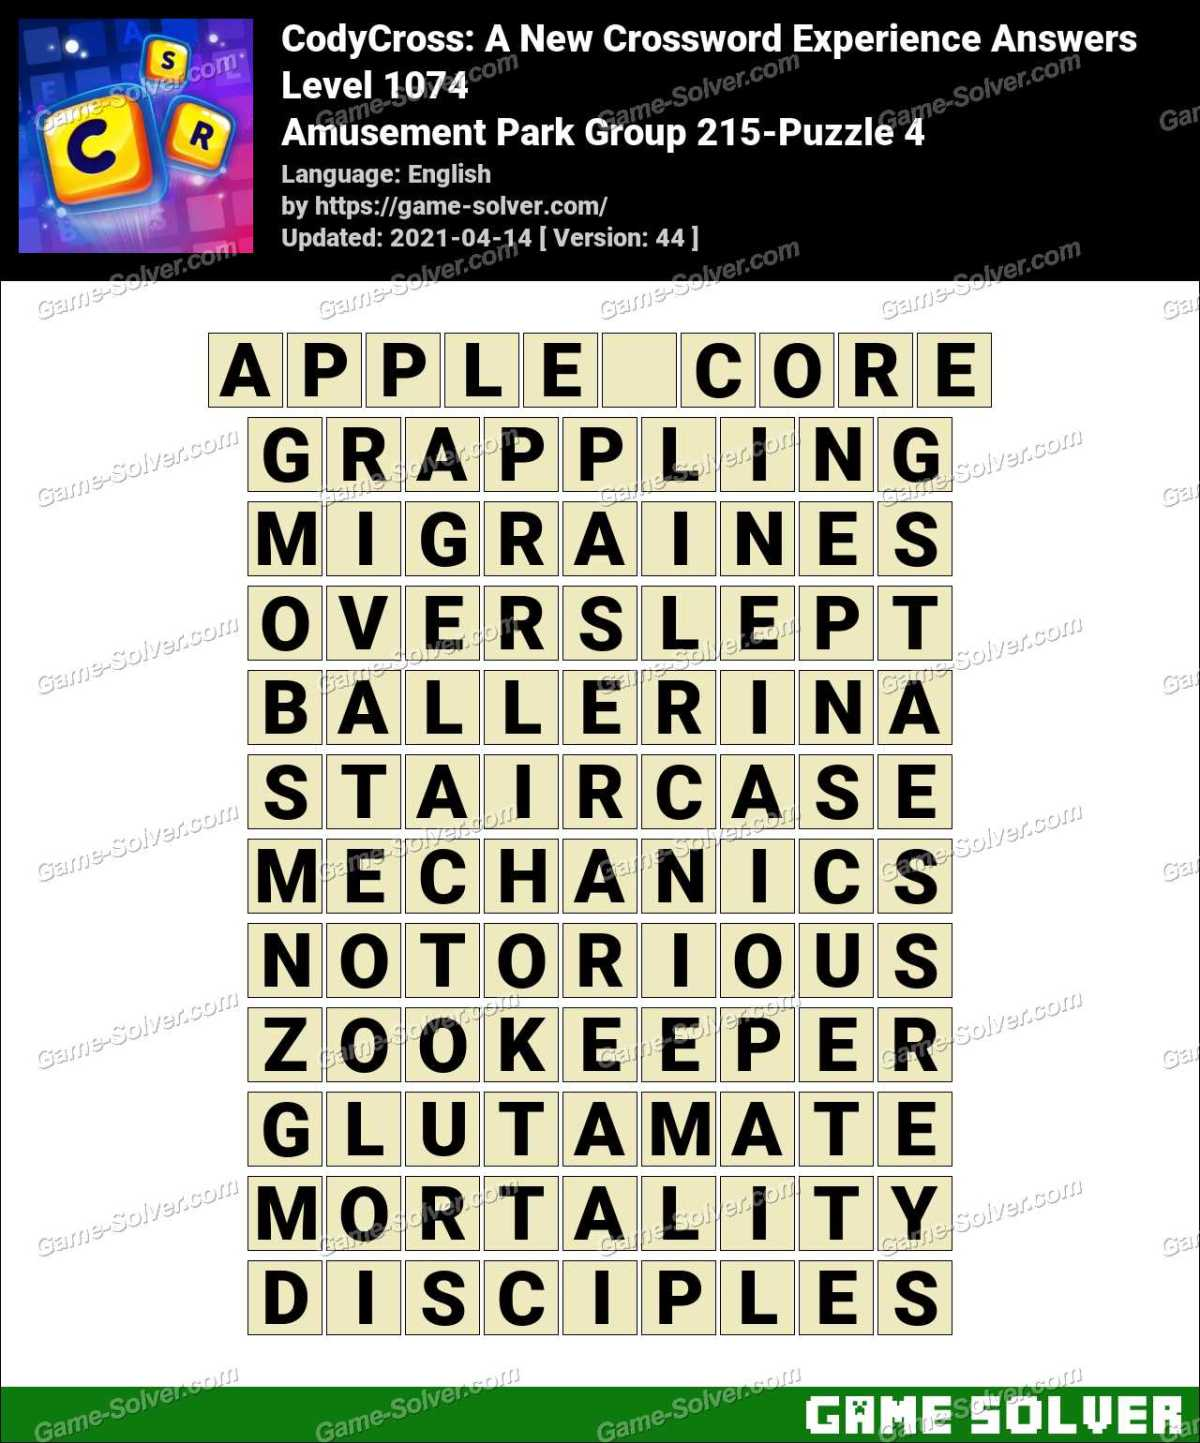 CodyCross Amusement Park Group 215-Puzzle 4 Answers